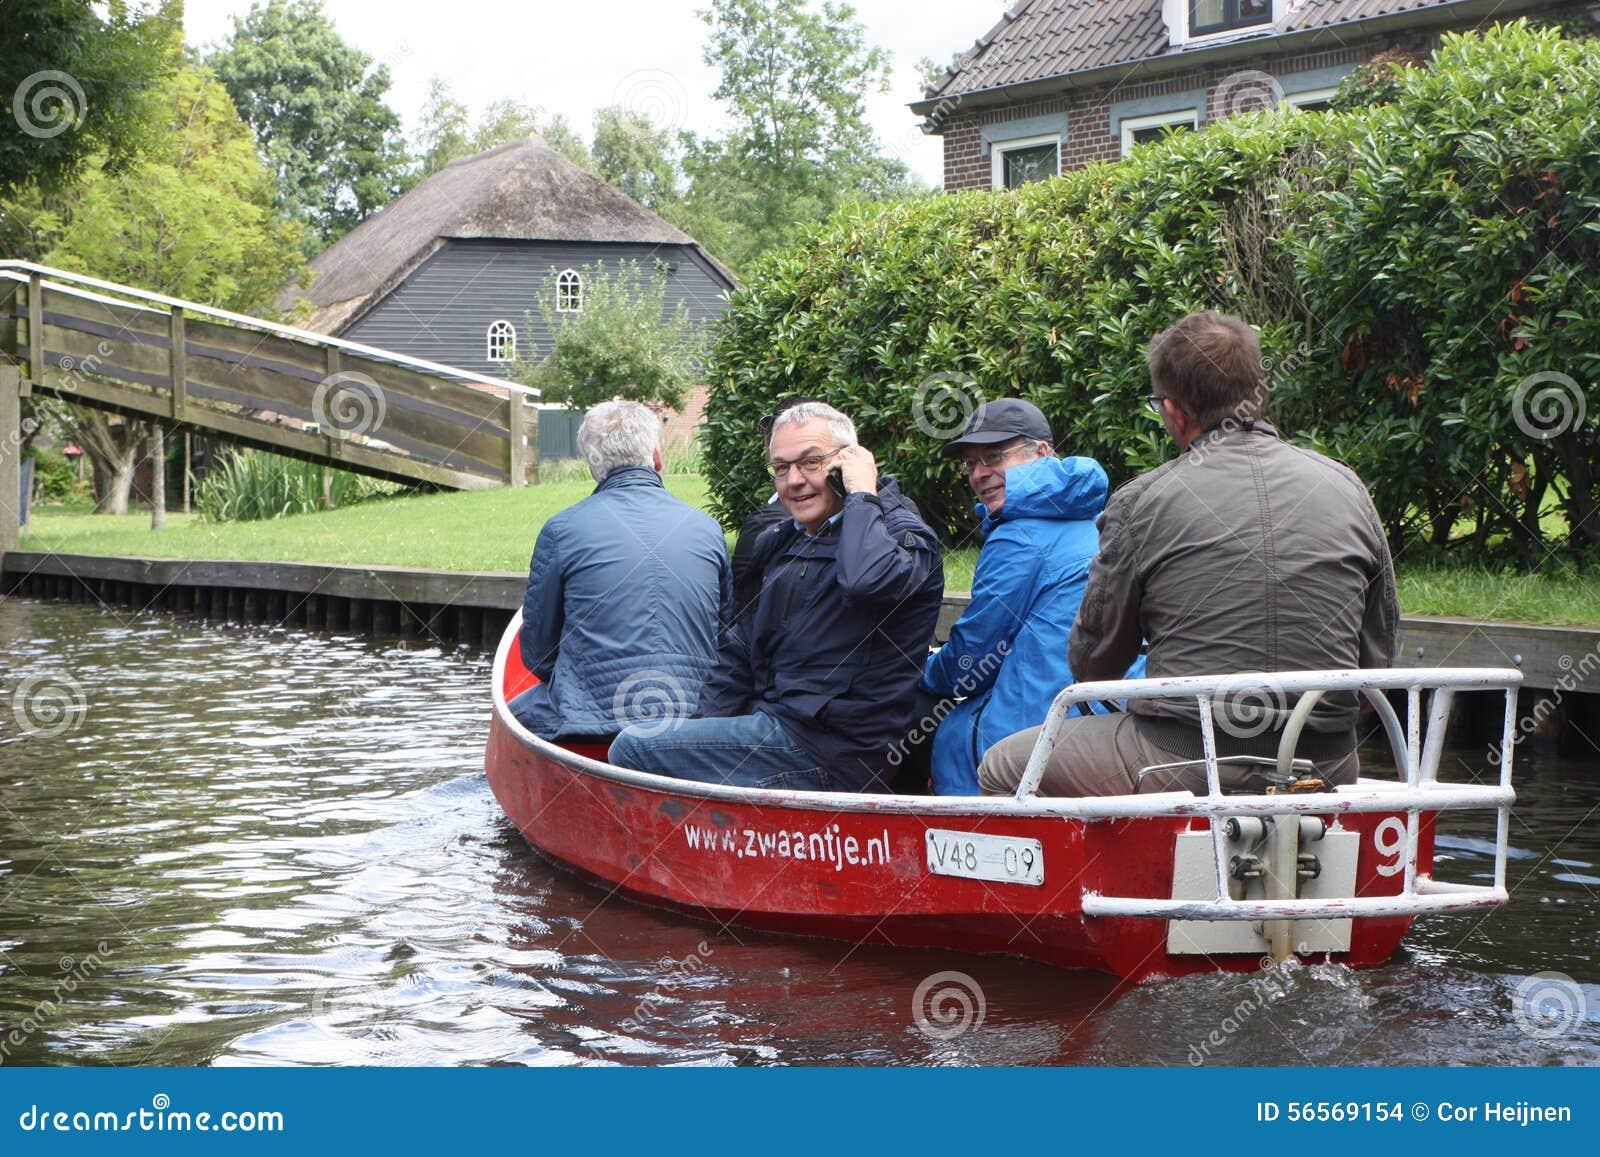 Download Giethoorn η ολλανδική Βενετία Εκδοτική Στοκ Εικόνα - εικόνα από headpiece, netherlands: 56569154